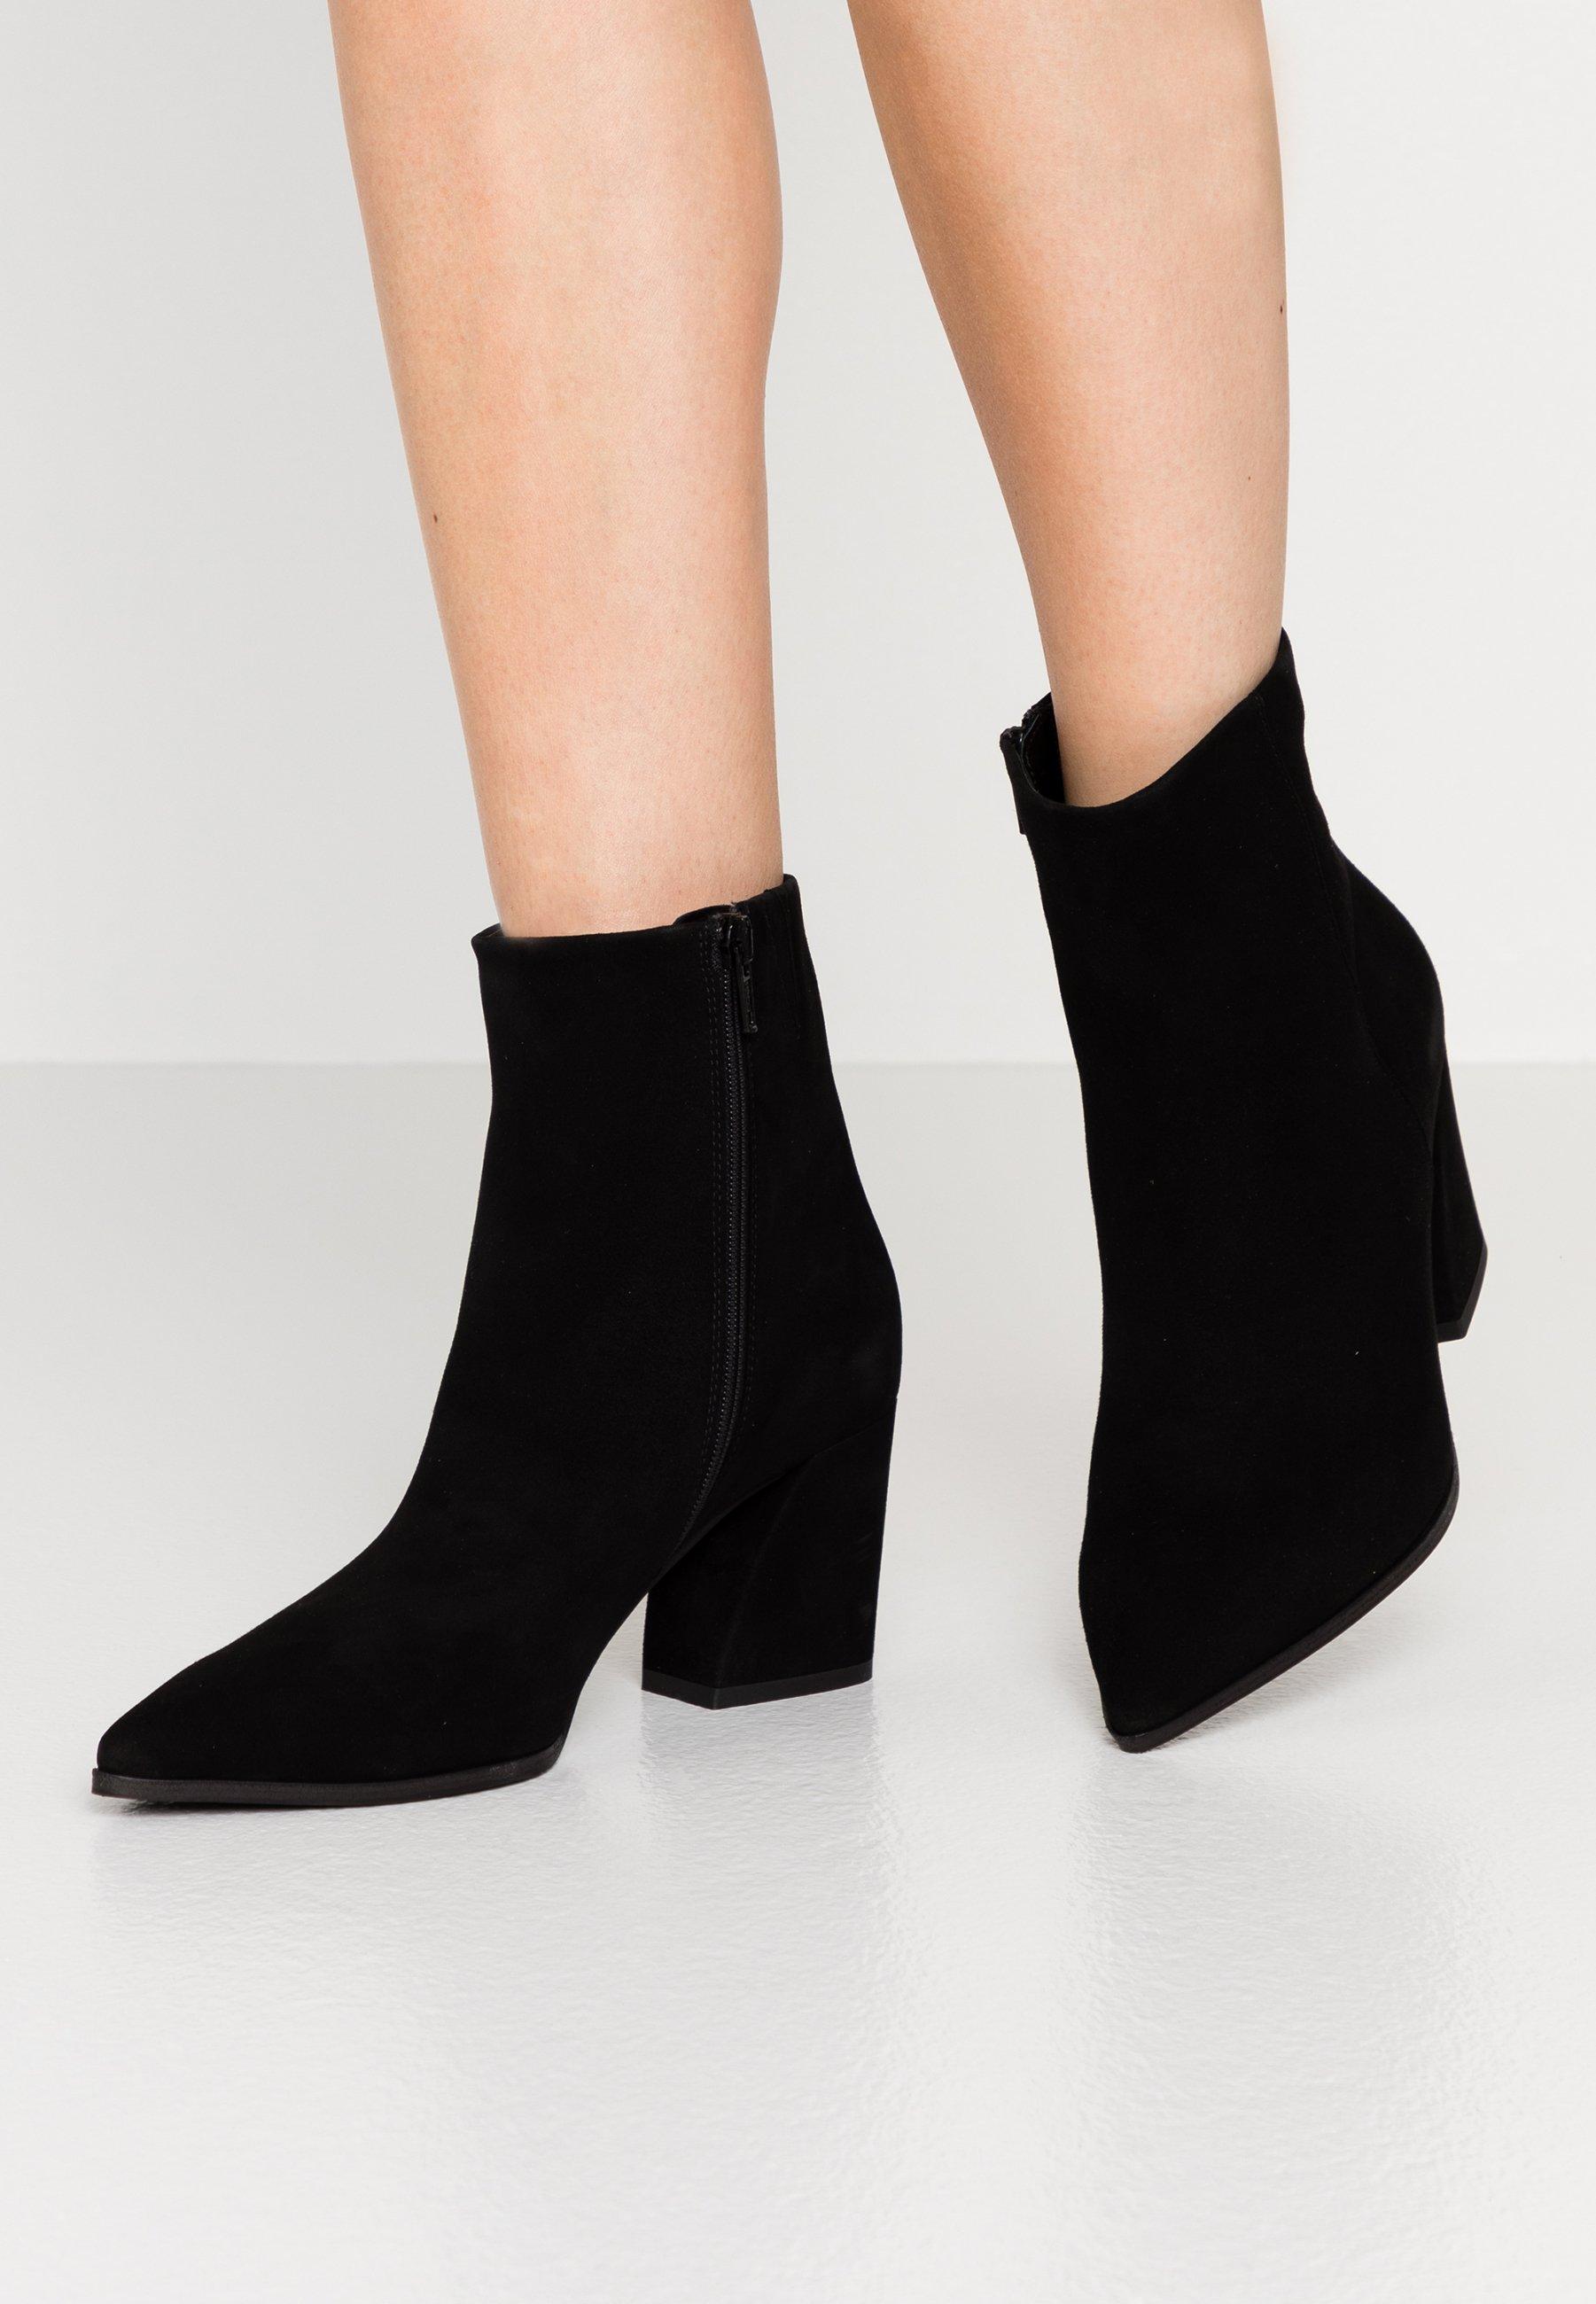 Kennel + Schmenger AMBER - Ankle Boot - schwarz | Damen Schuhe 2020